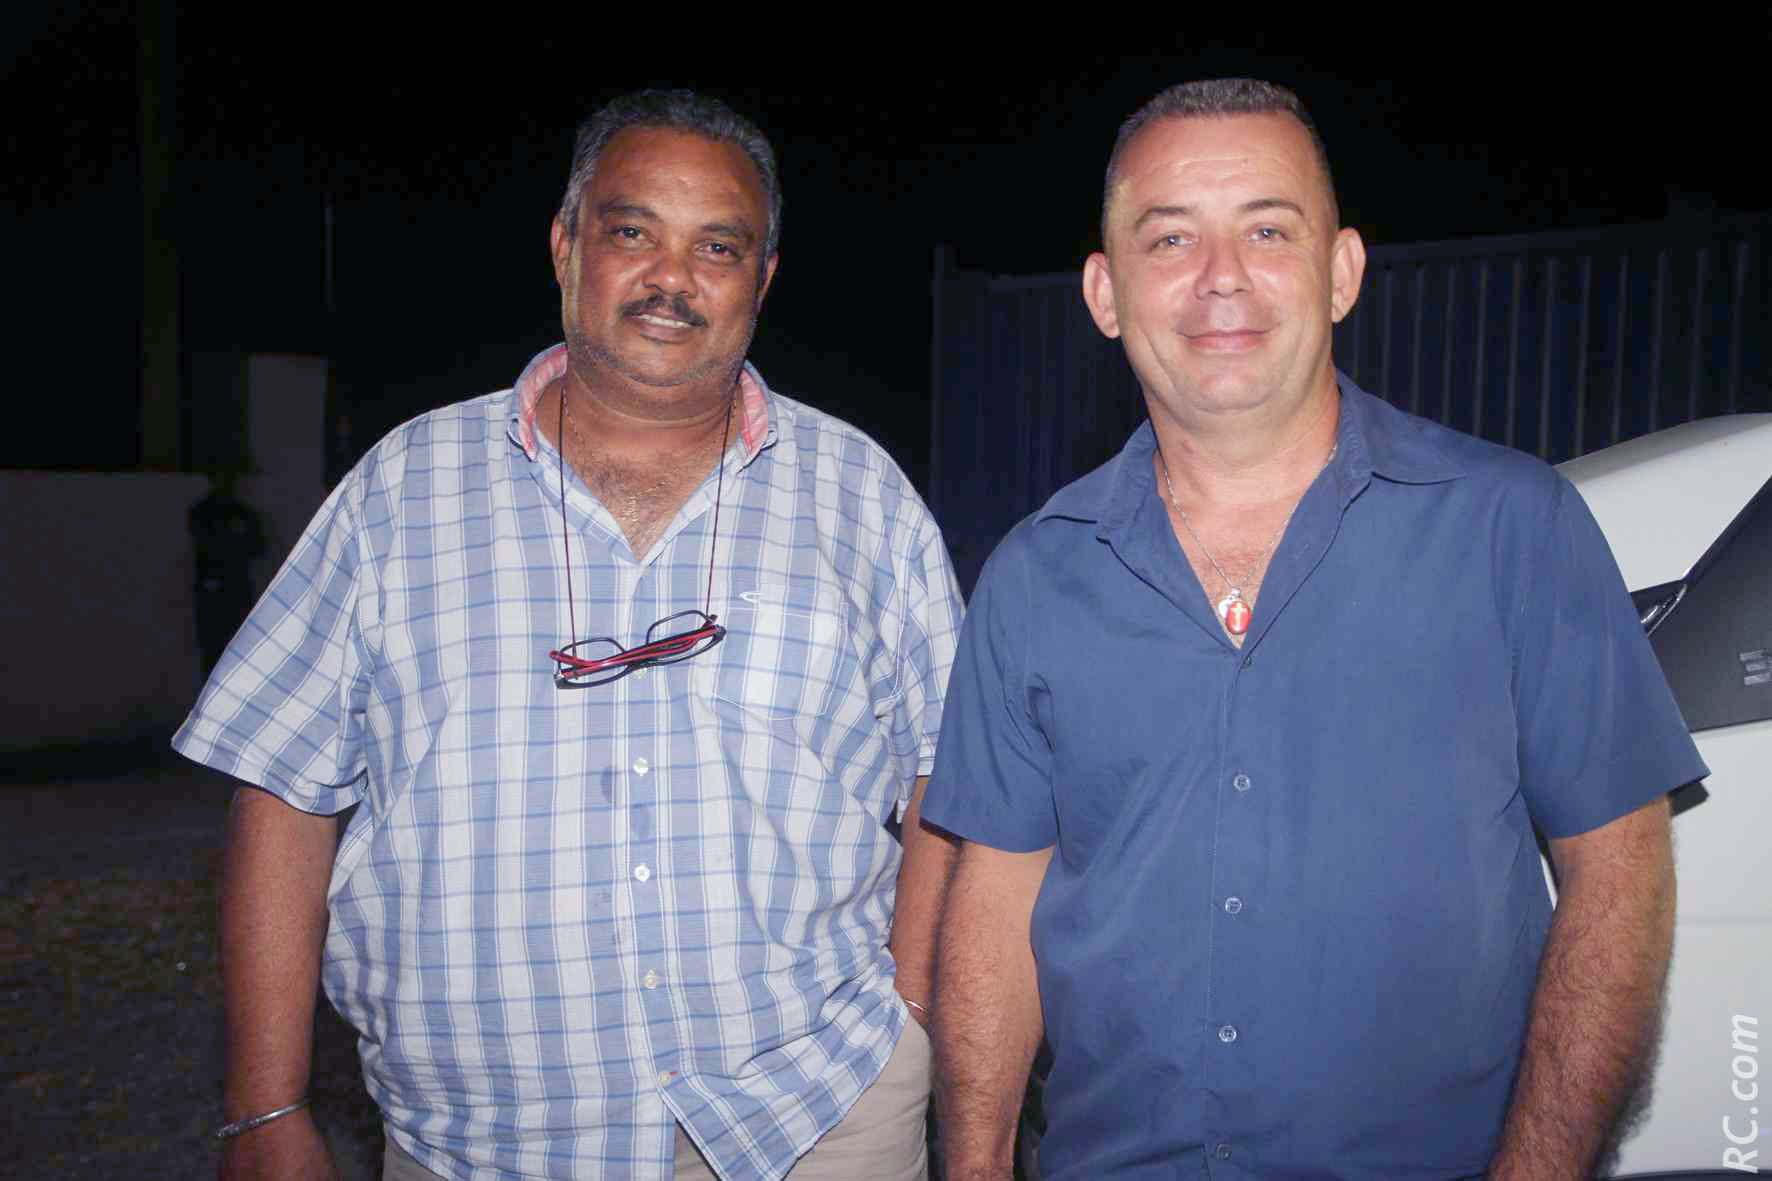 David Kichena de Groupement Kichena, et Patrice Mussard